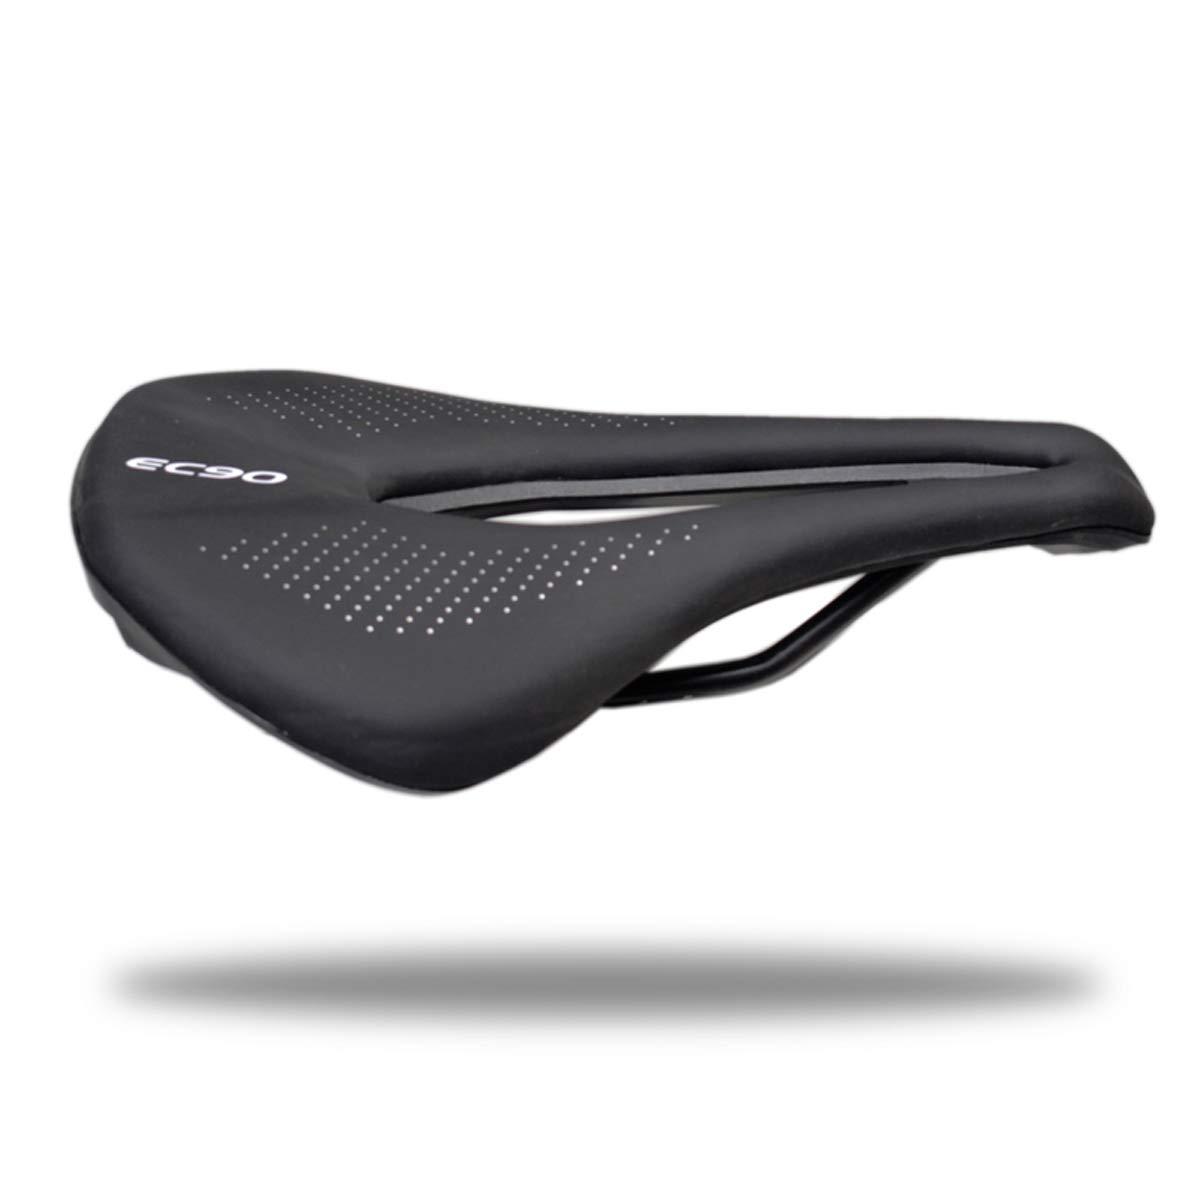 MTBロードバイクマウンテンバイクレーシング用プロフェッショナル自転車シートサドルPU通気性ソフトシートクッション  ブラック B07LG9H8ZM